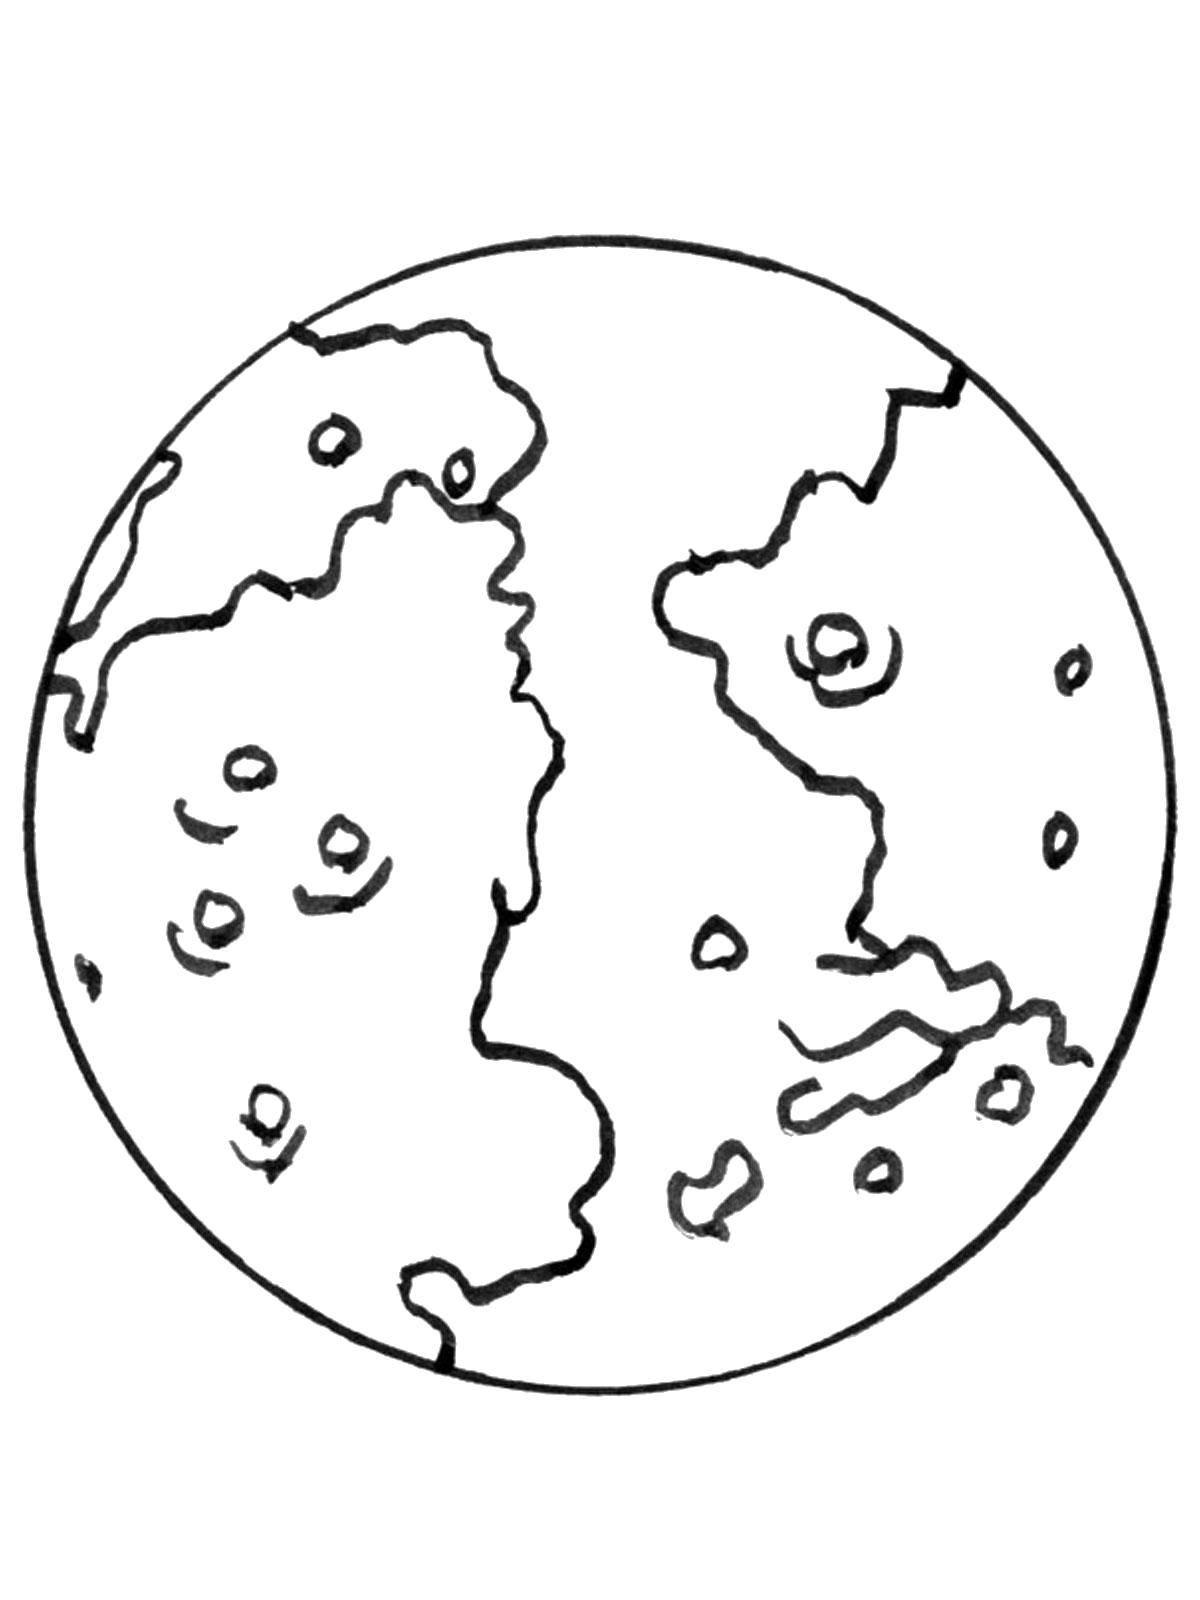 Раскраска Леди Баг и Супер Кот на детском интернет портале Чурики   1600x1200